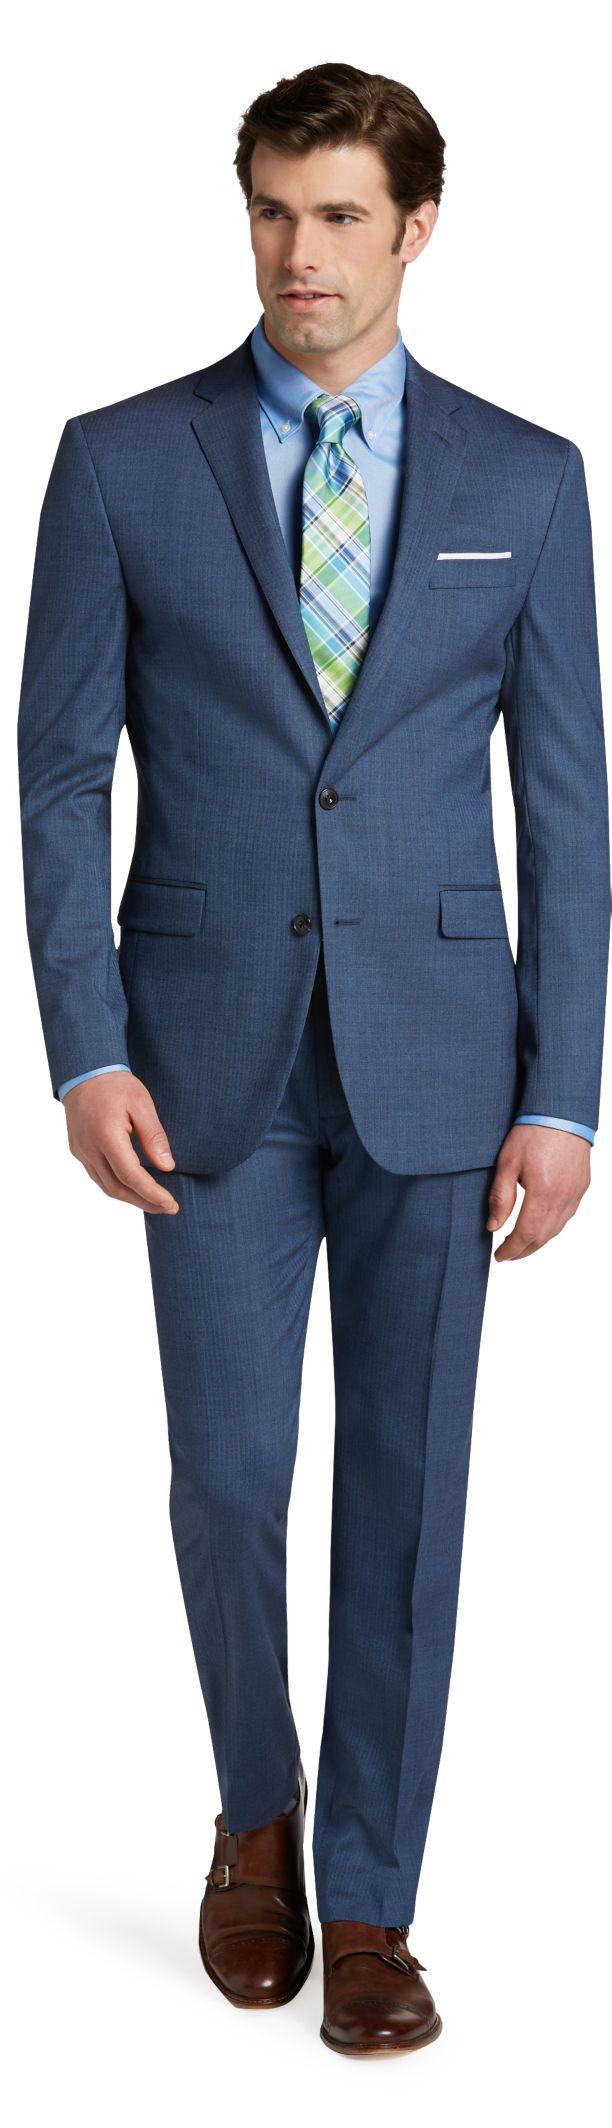 slim fit suits menu0027s suits, 1905 collection slim fit herringbone suit - jos a bank WMAFFXH